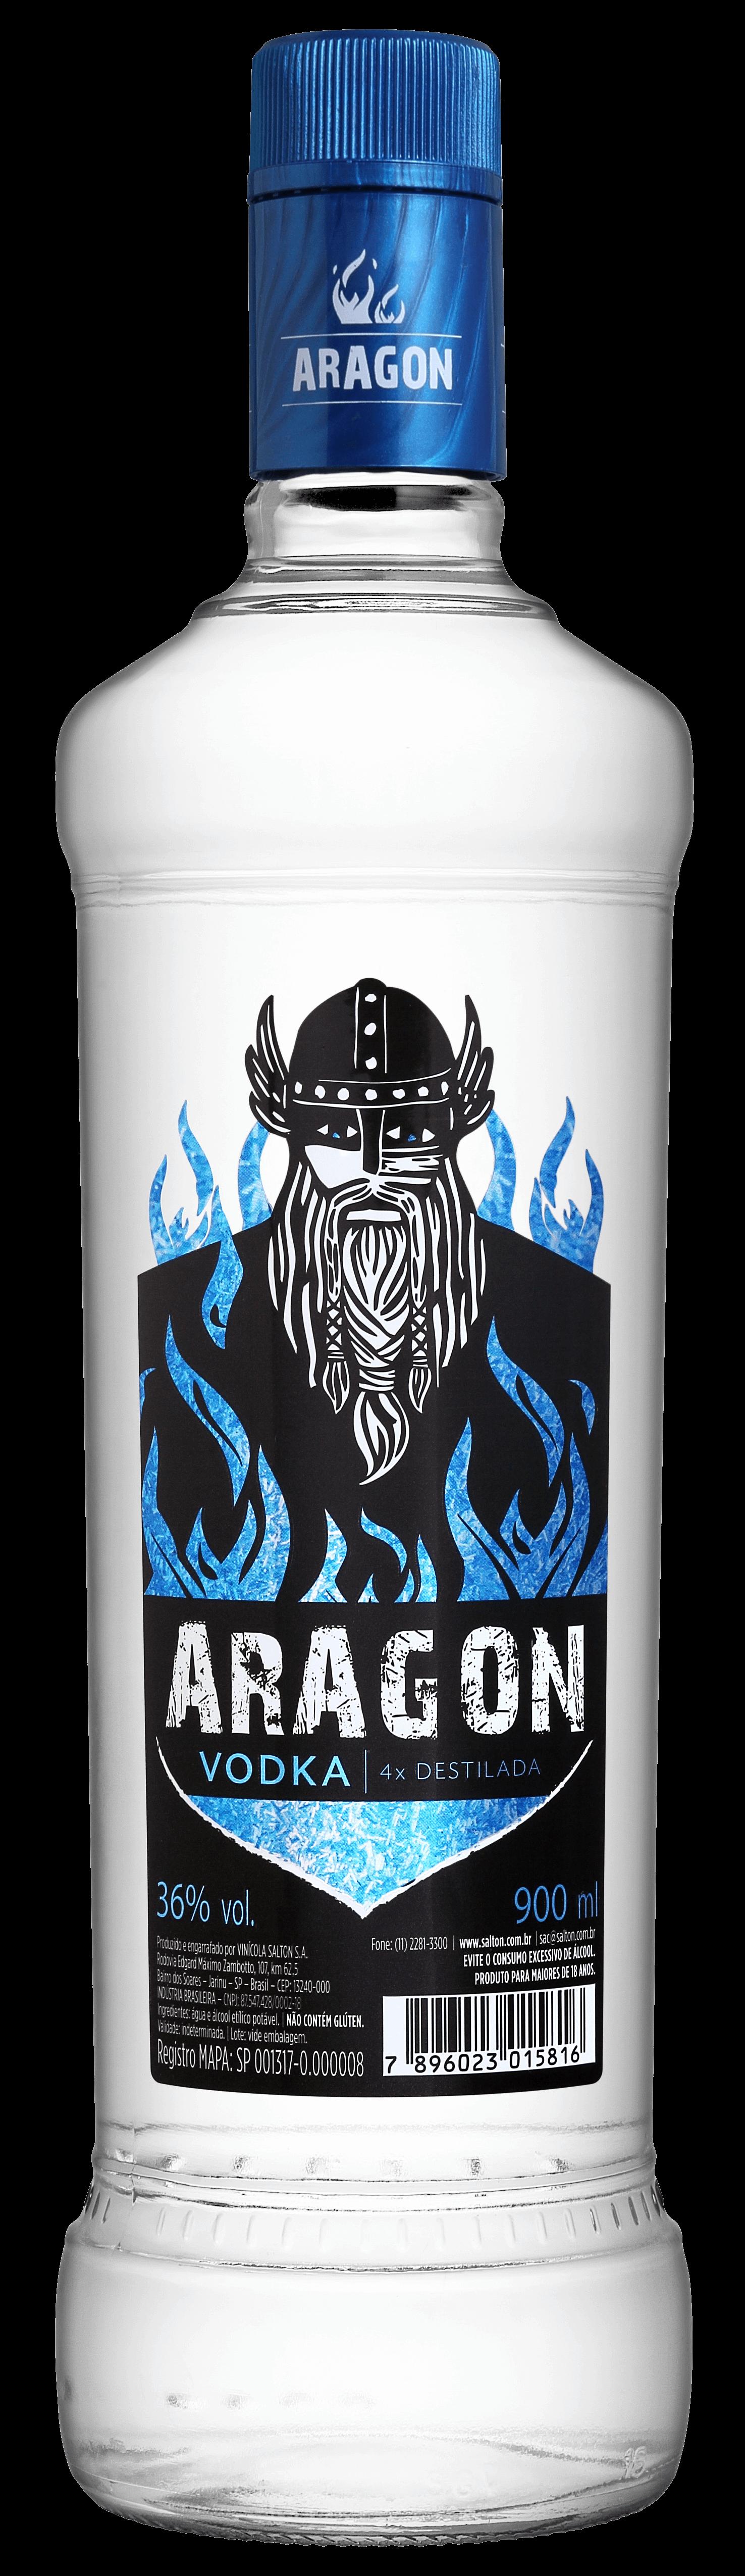 Vodka Aragon